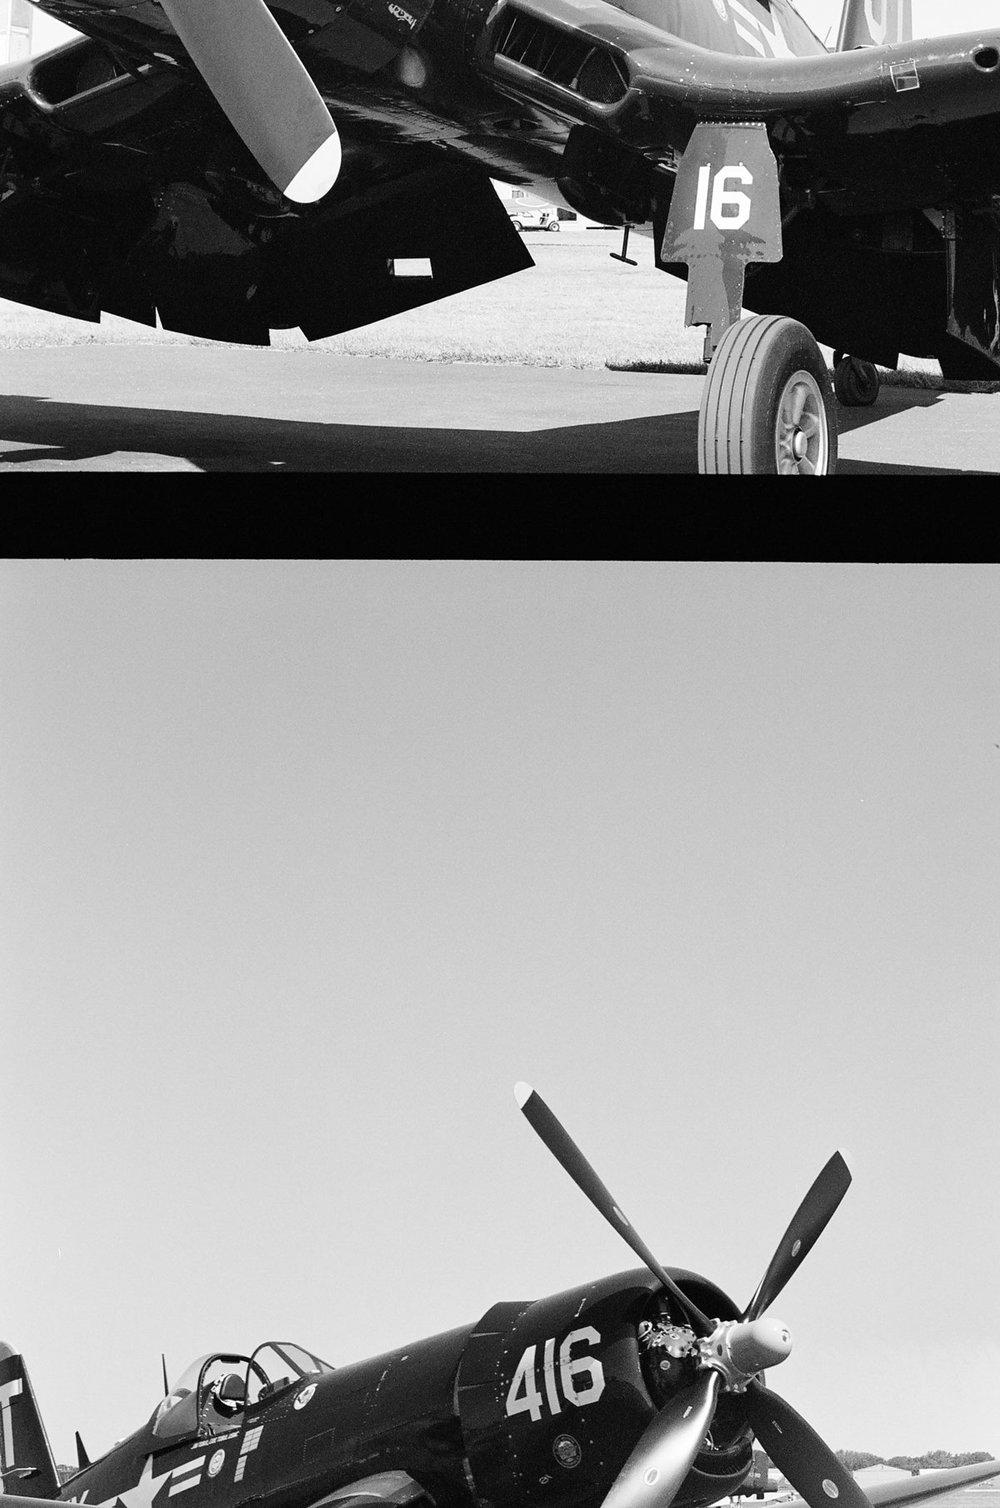 alex-laniosz-airventure-double-exposure-1.jpg